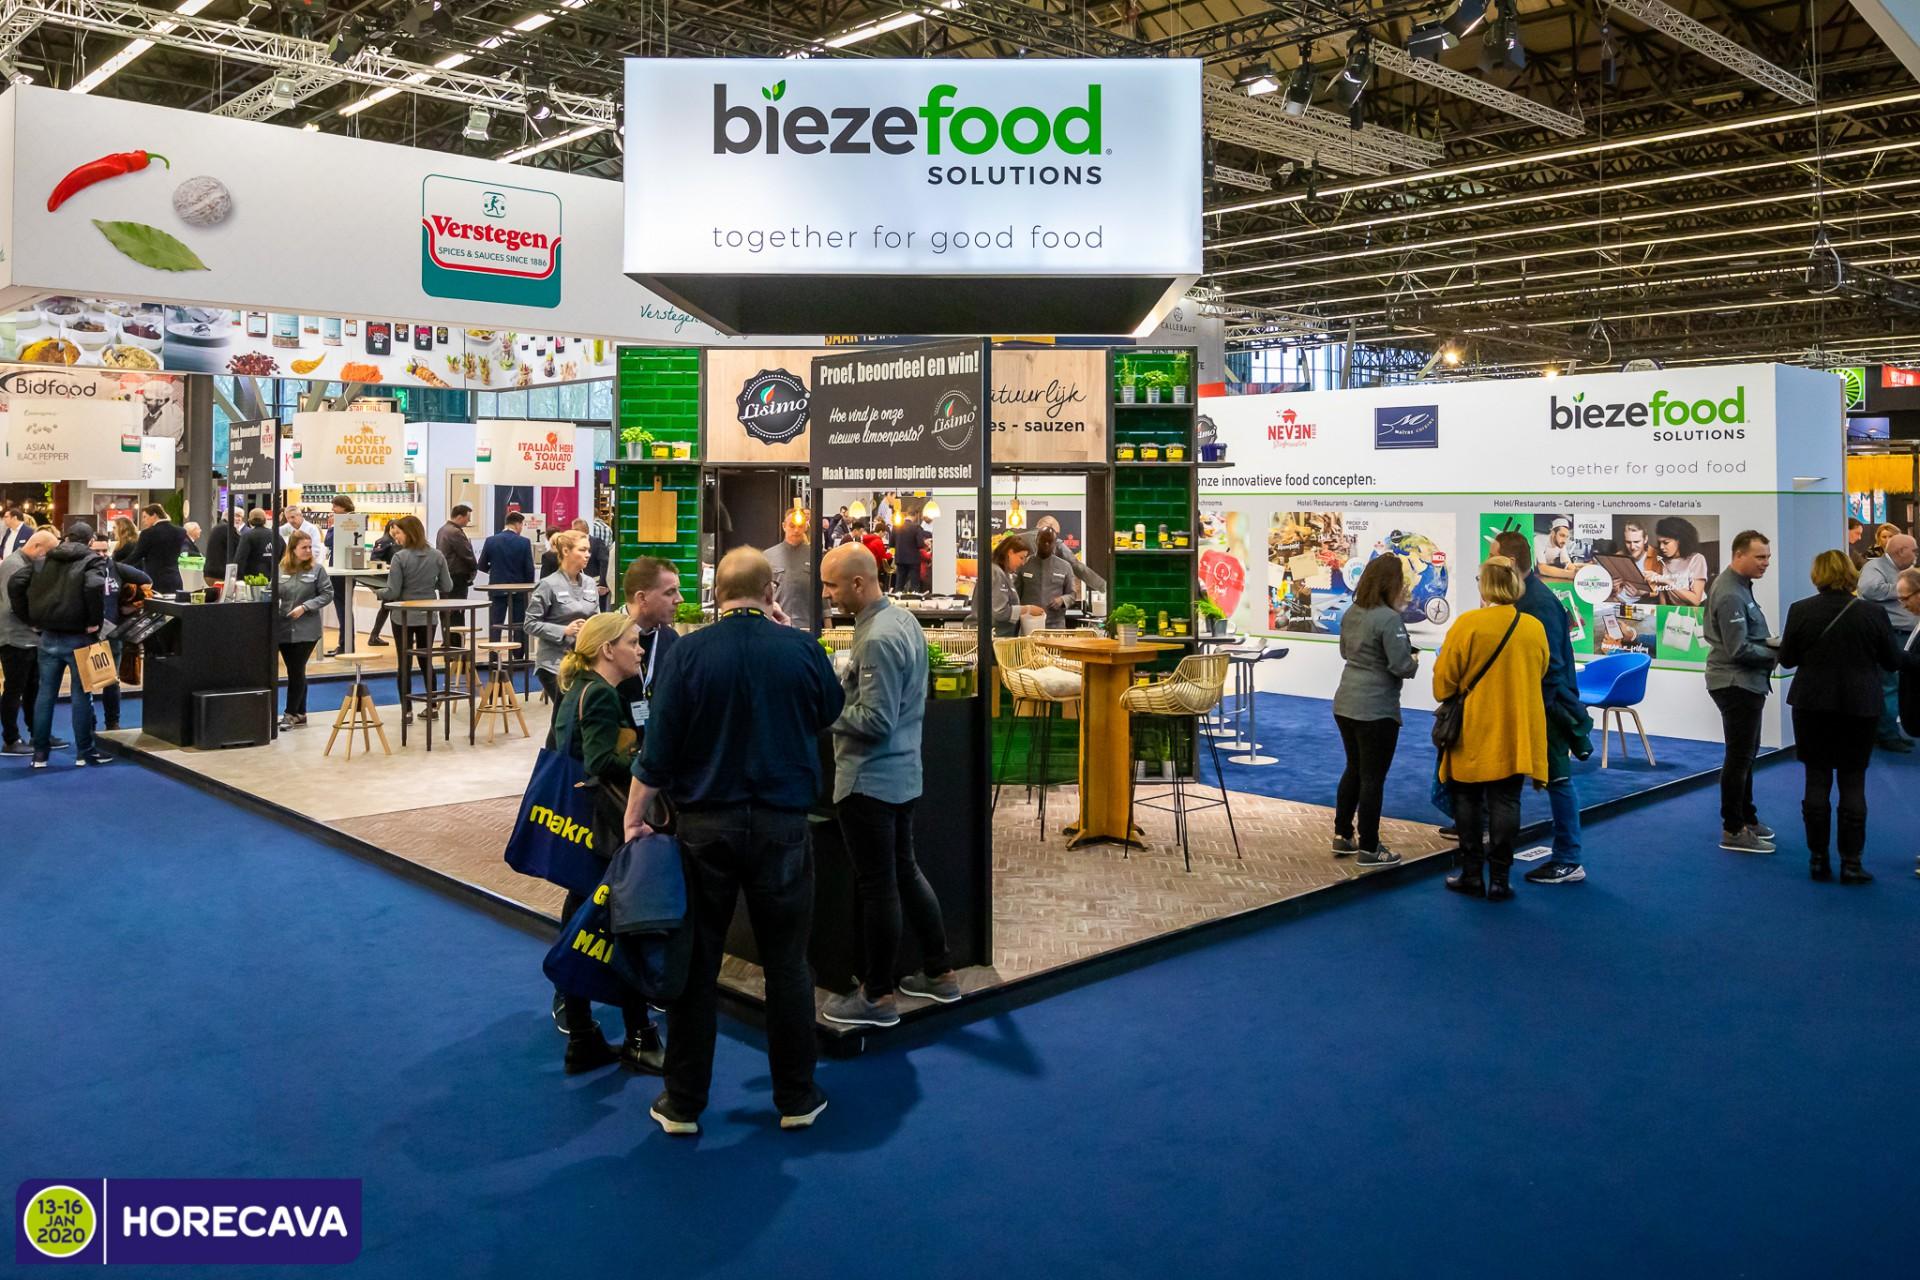 07.223 Bieze Food Solutions